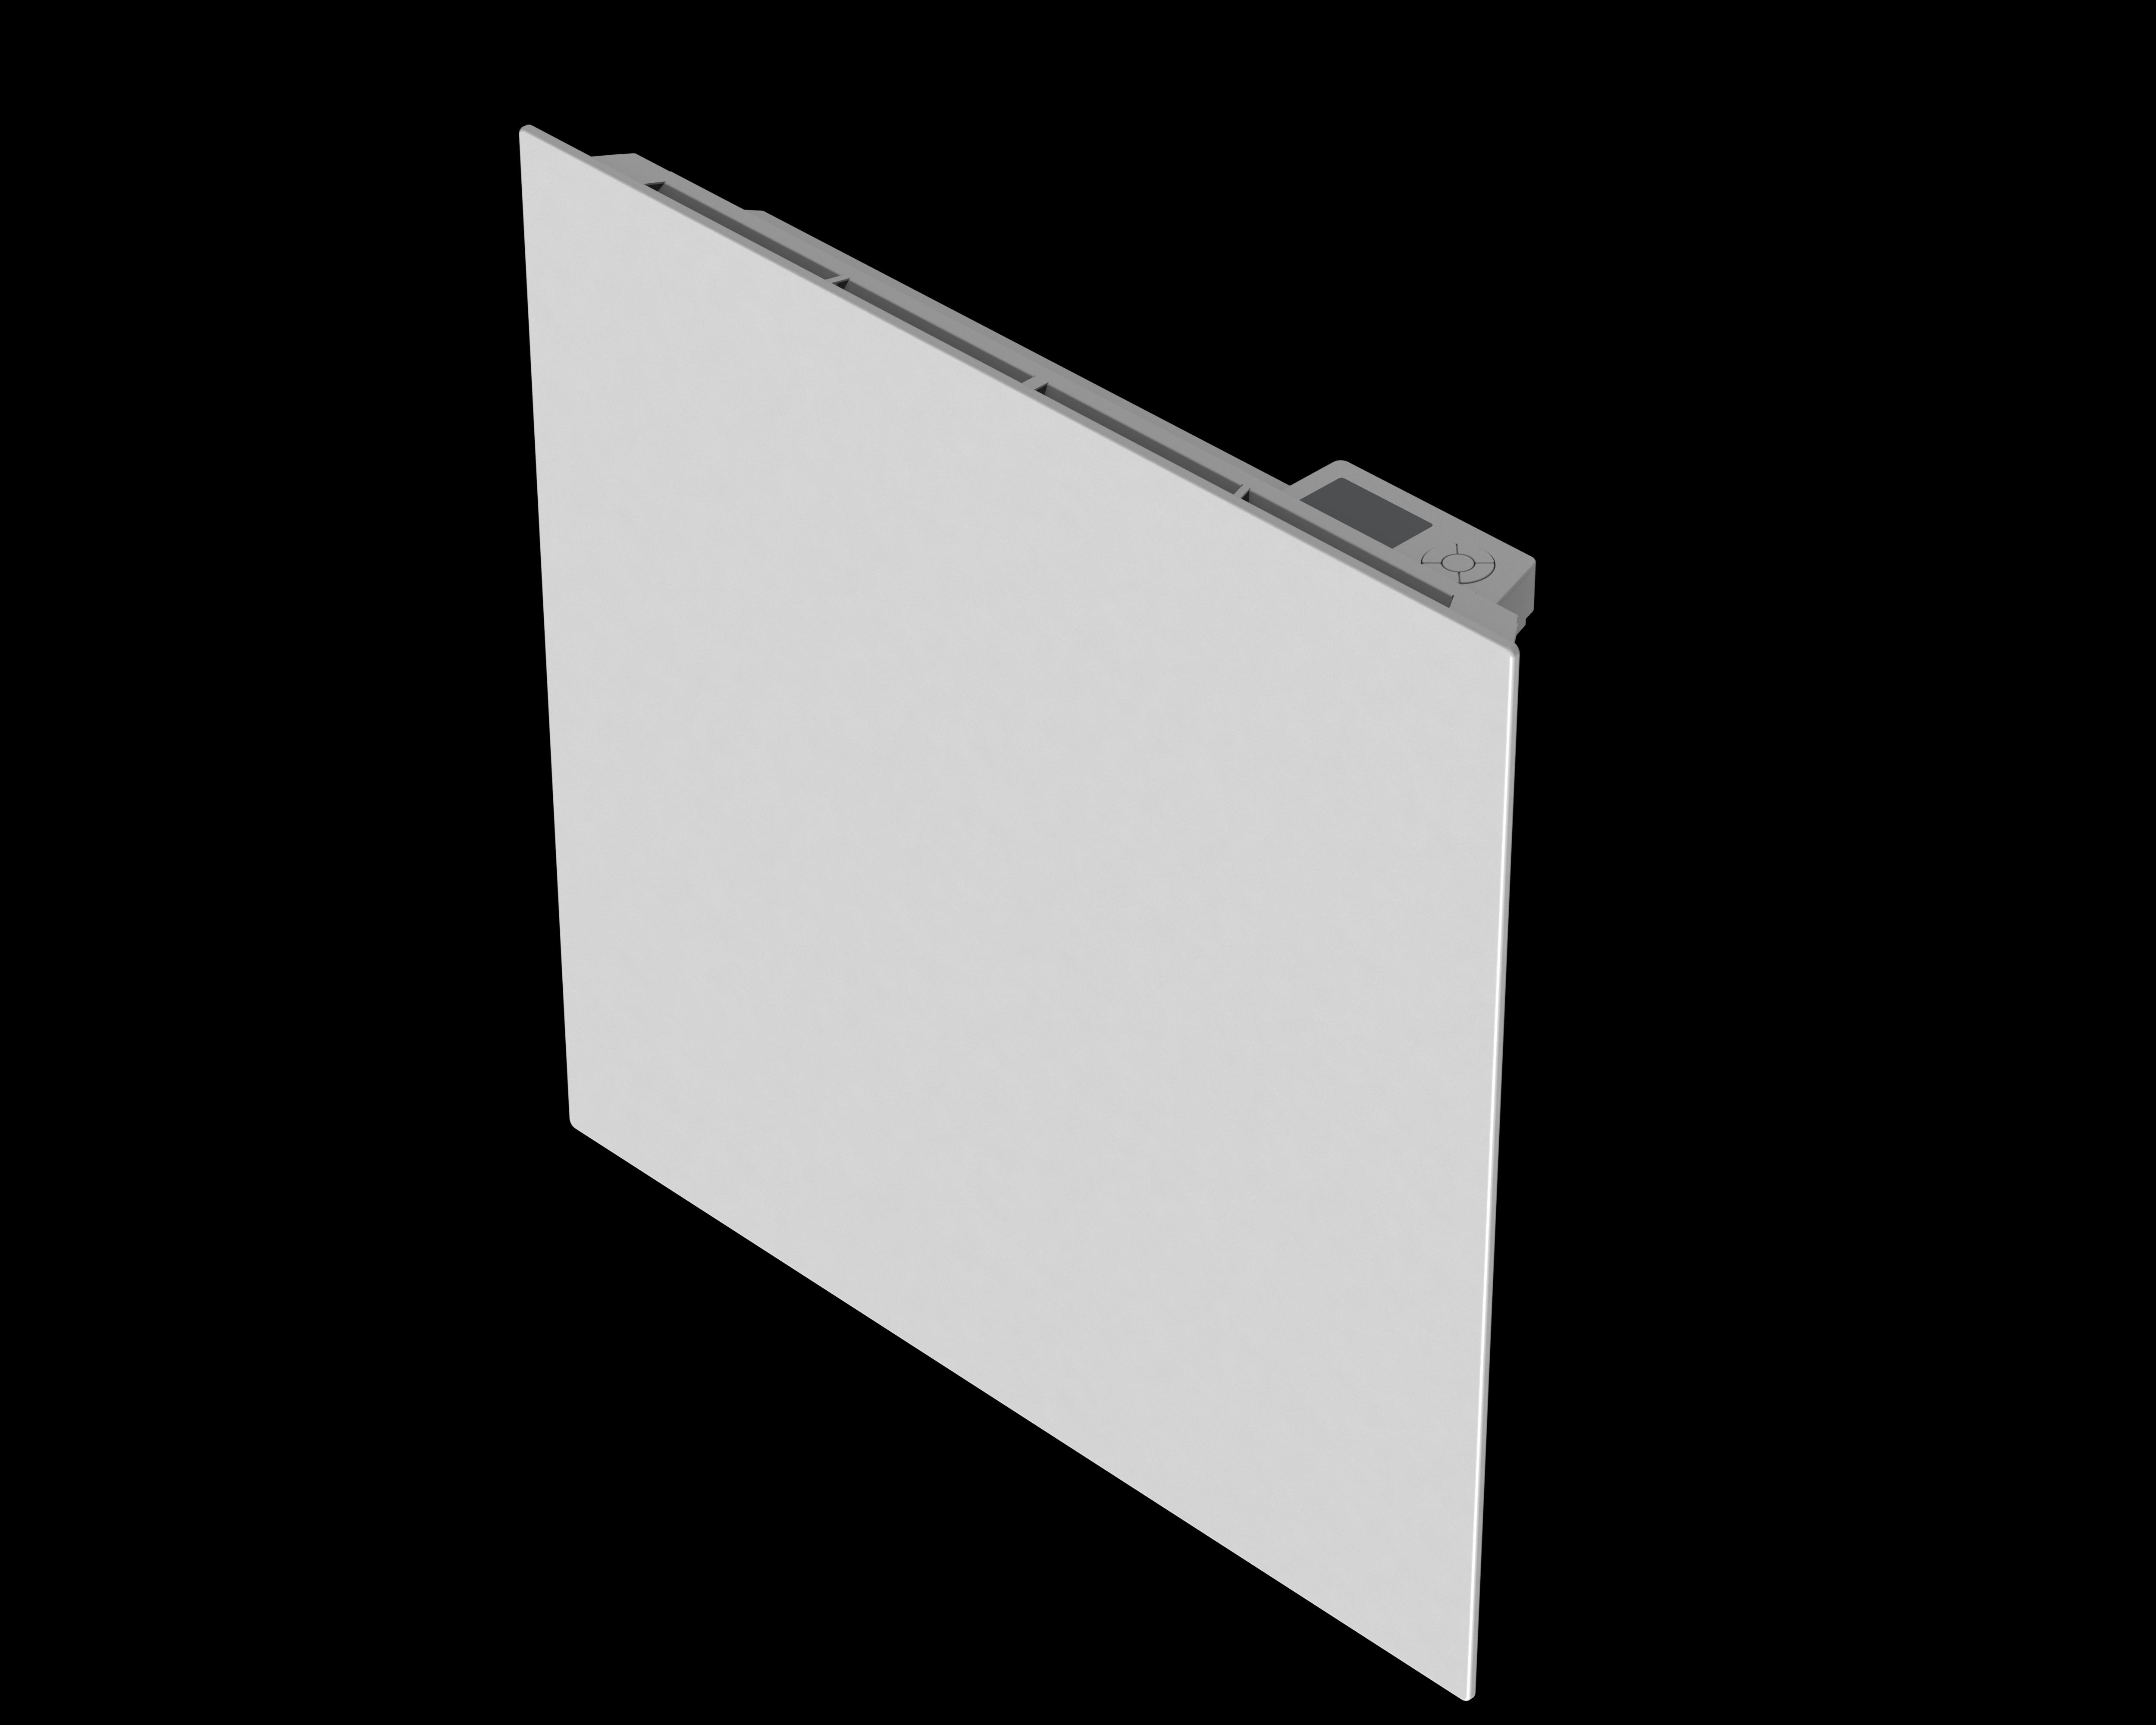 carrera radiateur inertie en fonte milo verre lcd 1000w pas cher achat vente radiateur. Black Bedroom Furniture Sets. Home Design Ideas